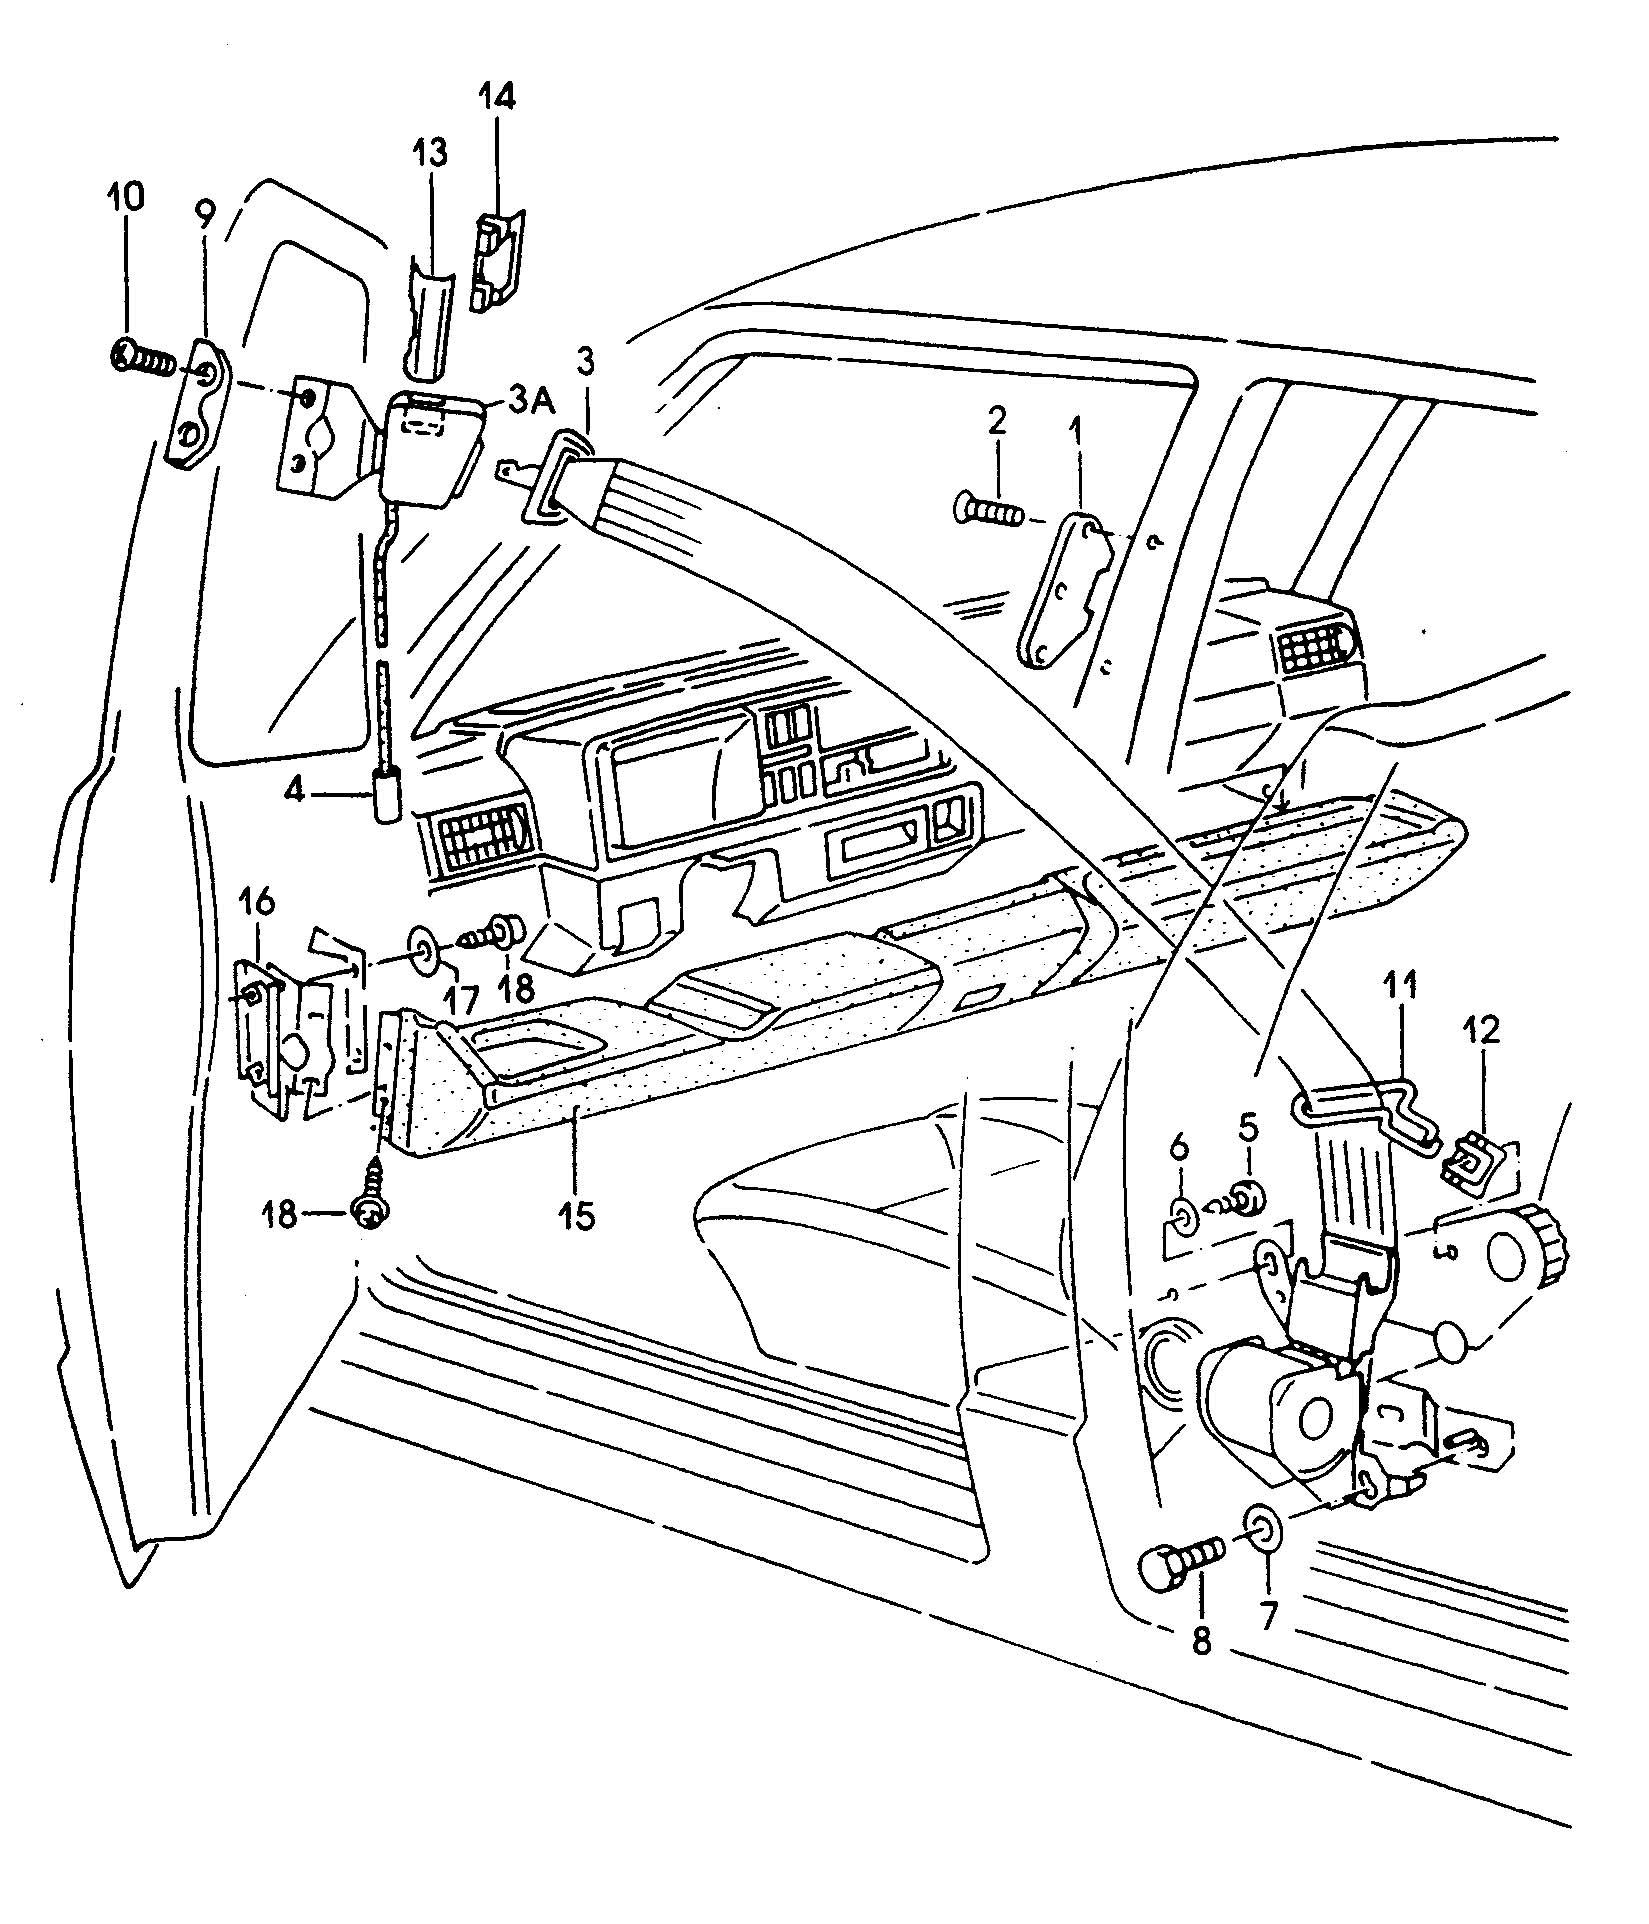 Volkswagen Golf 2 Point Seat Belt Knee Bar Front